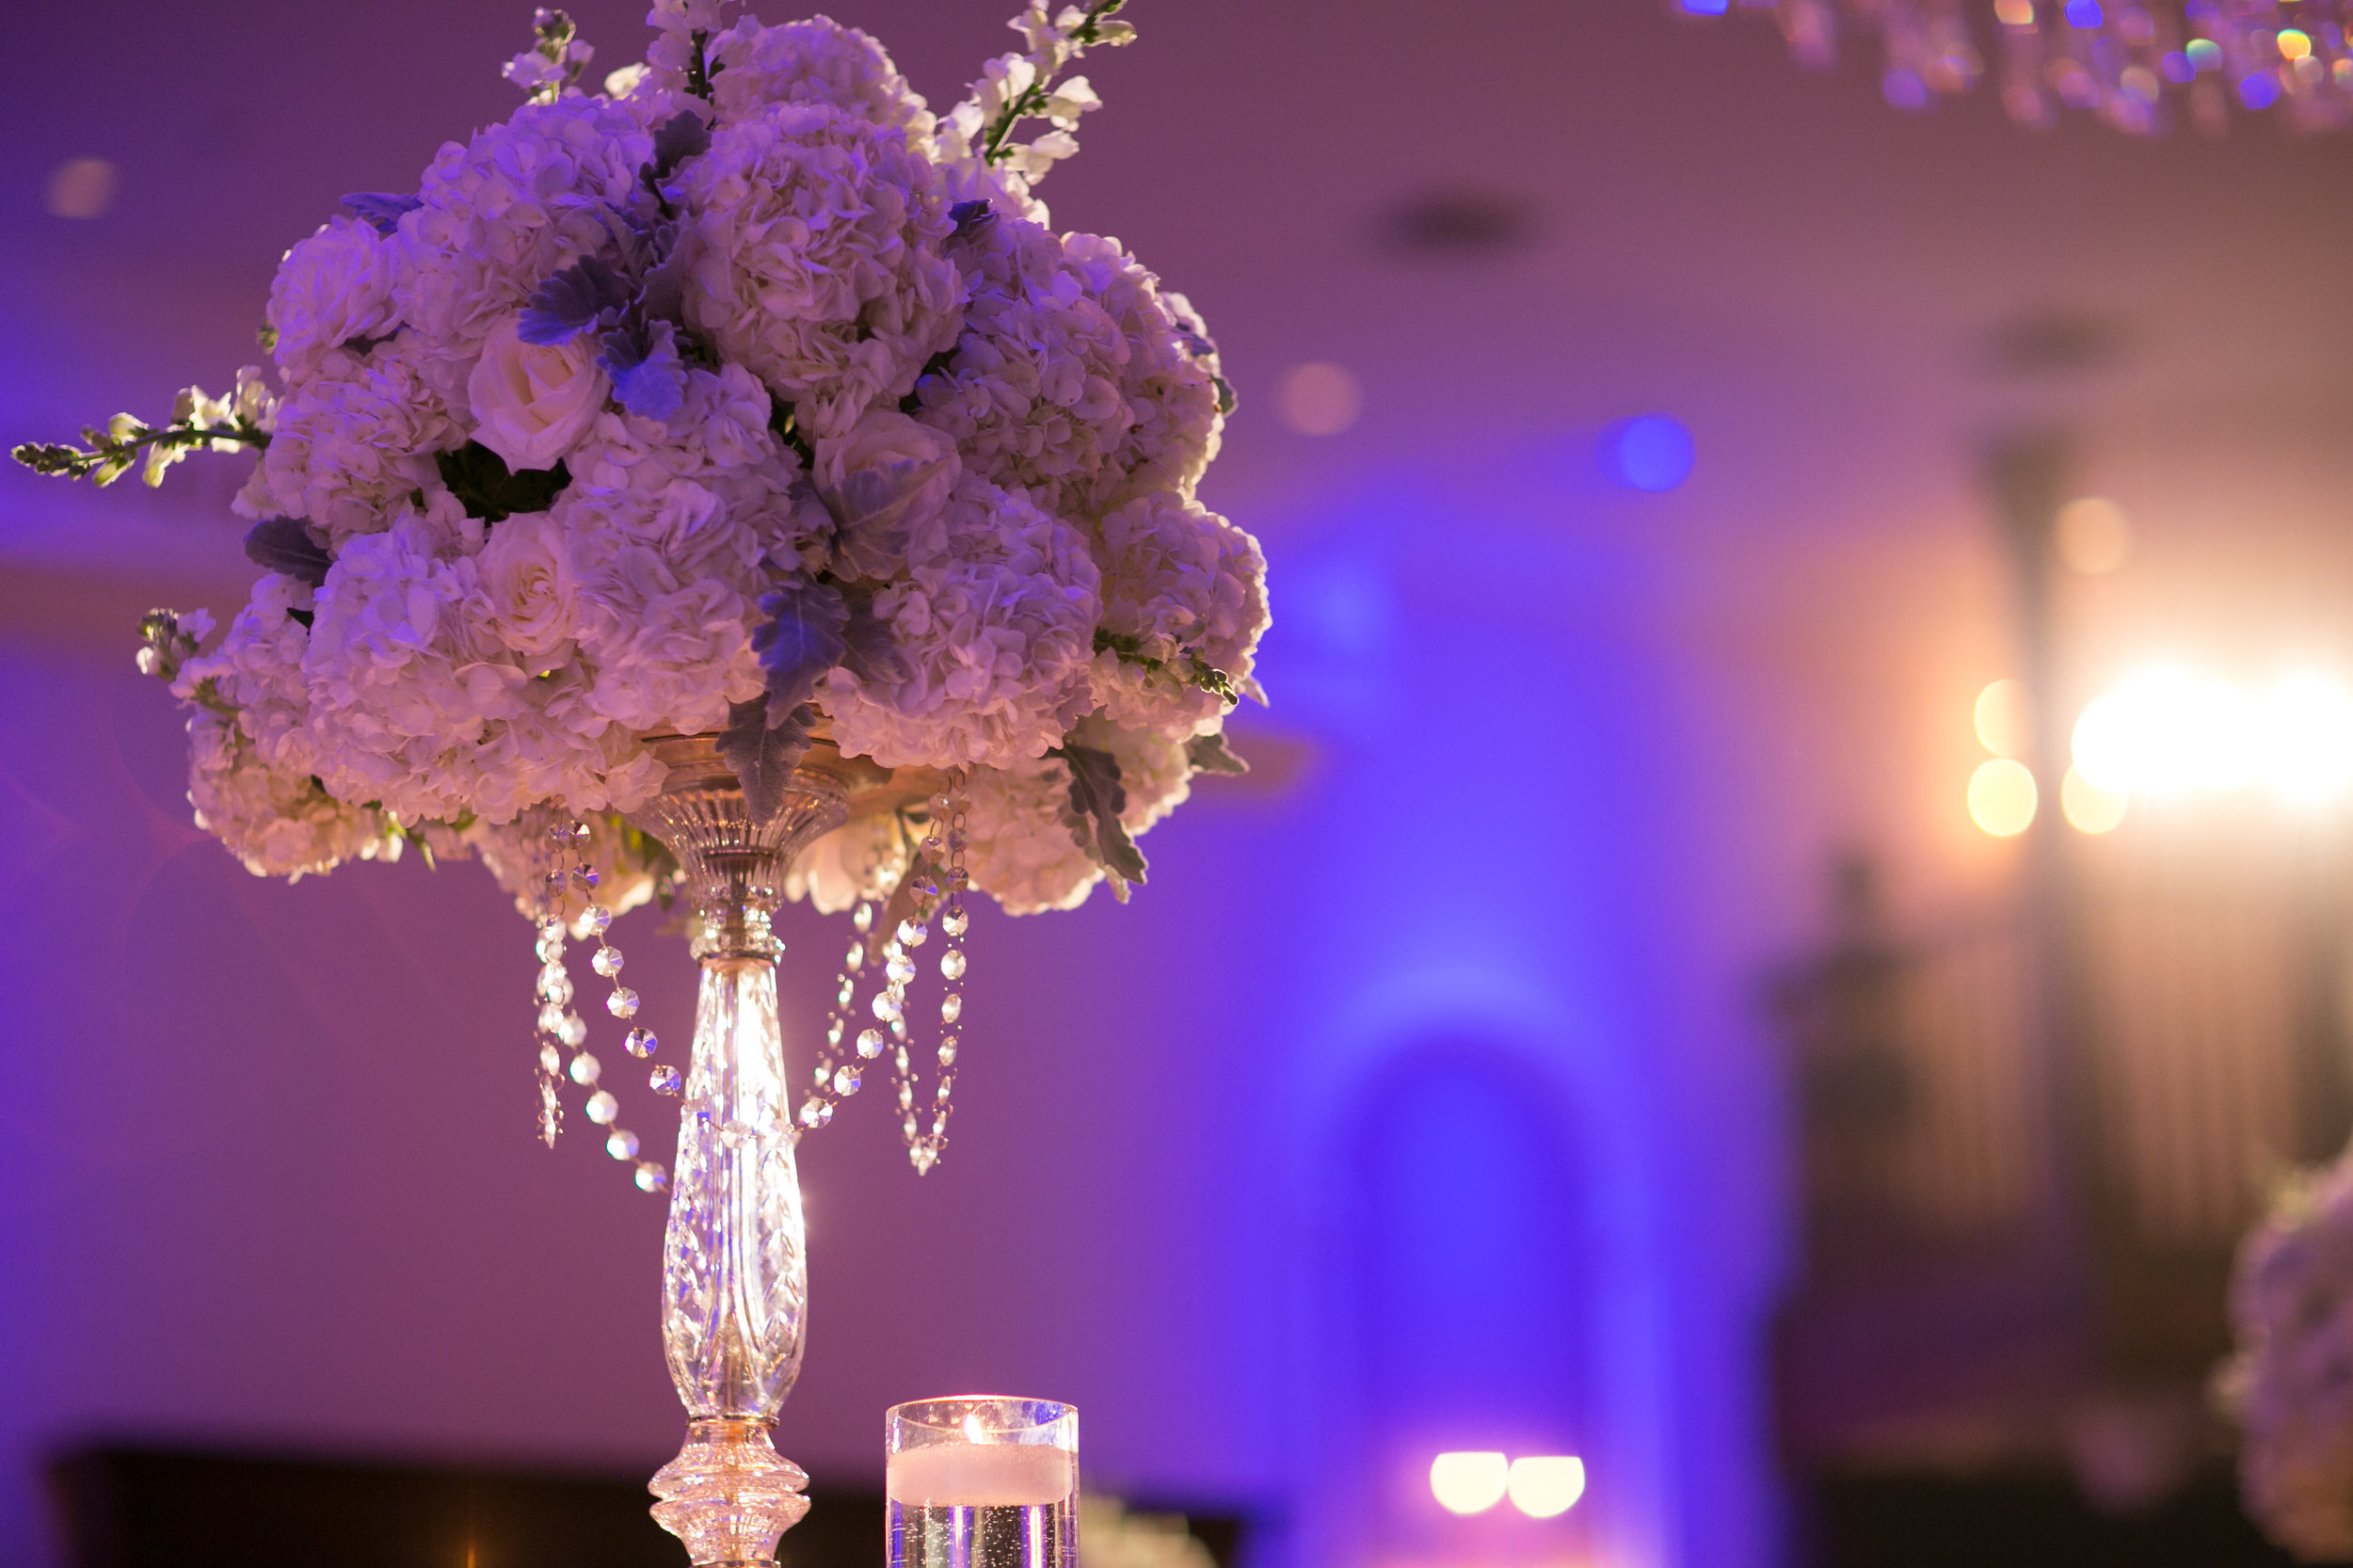 Ceci_New_York_Custom_Invitation_ New_Jersey_Wedding_Luxury_Personalized_Ceci_Style_Bride_Foil_Stamping61.jpg